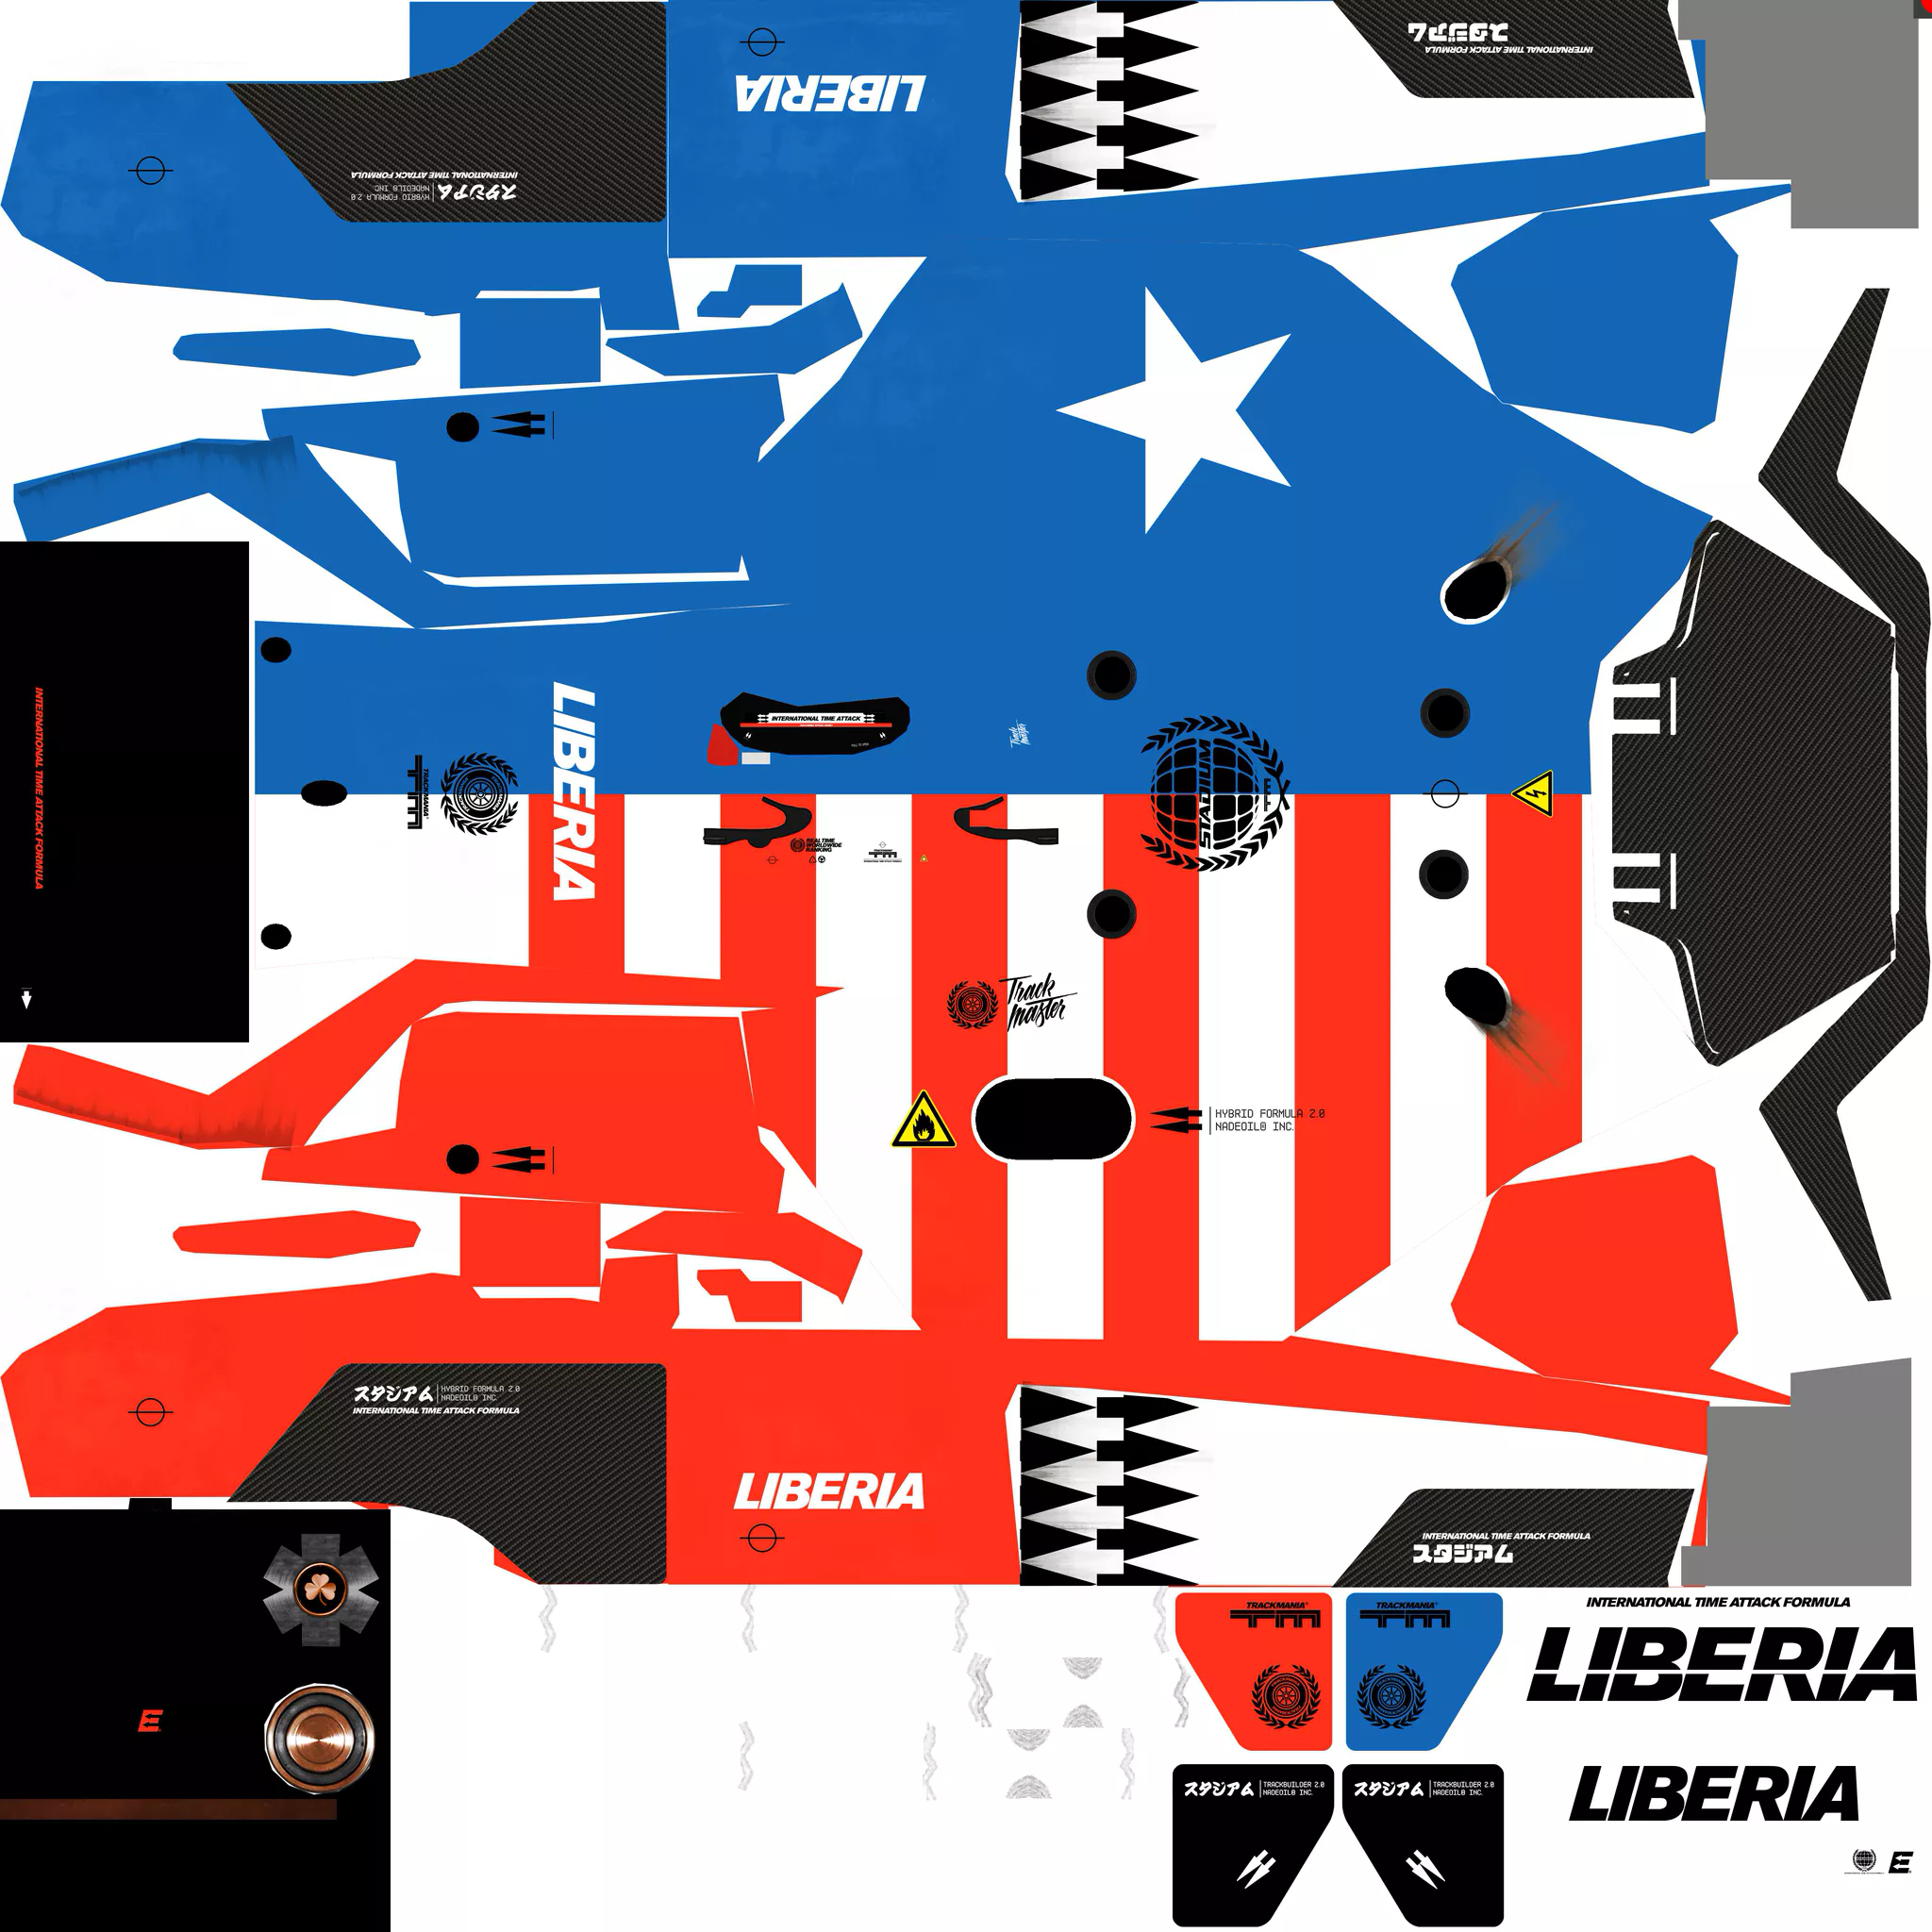 PC / Computer - TrackMania Turbo - Liberia - The Textures